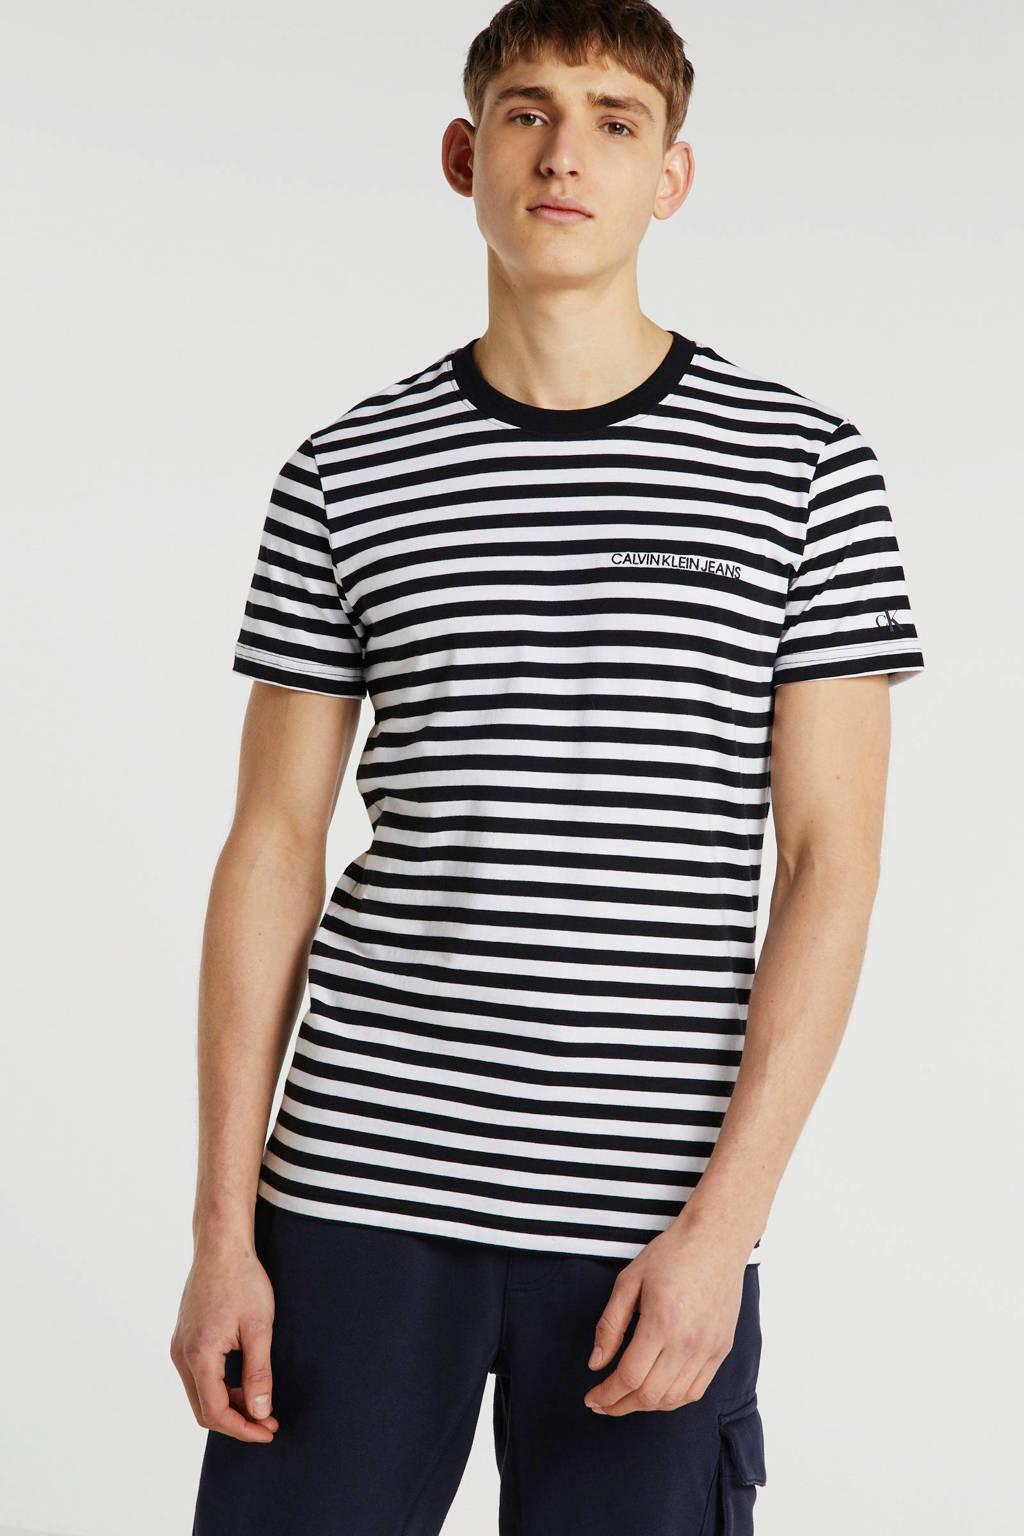 CALVIN KLEIN JEANS gestreept T-shirt wit, Wit